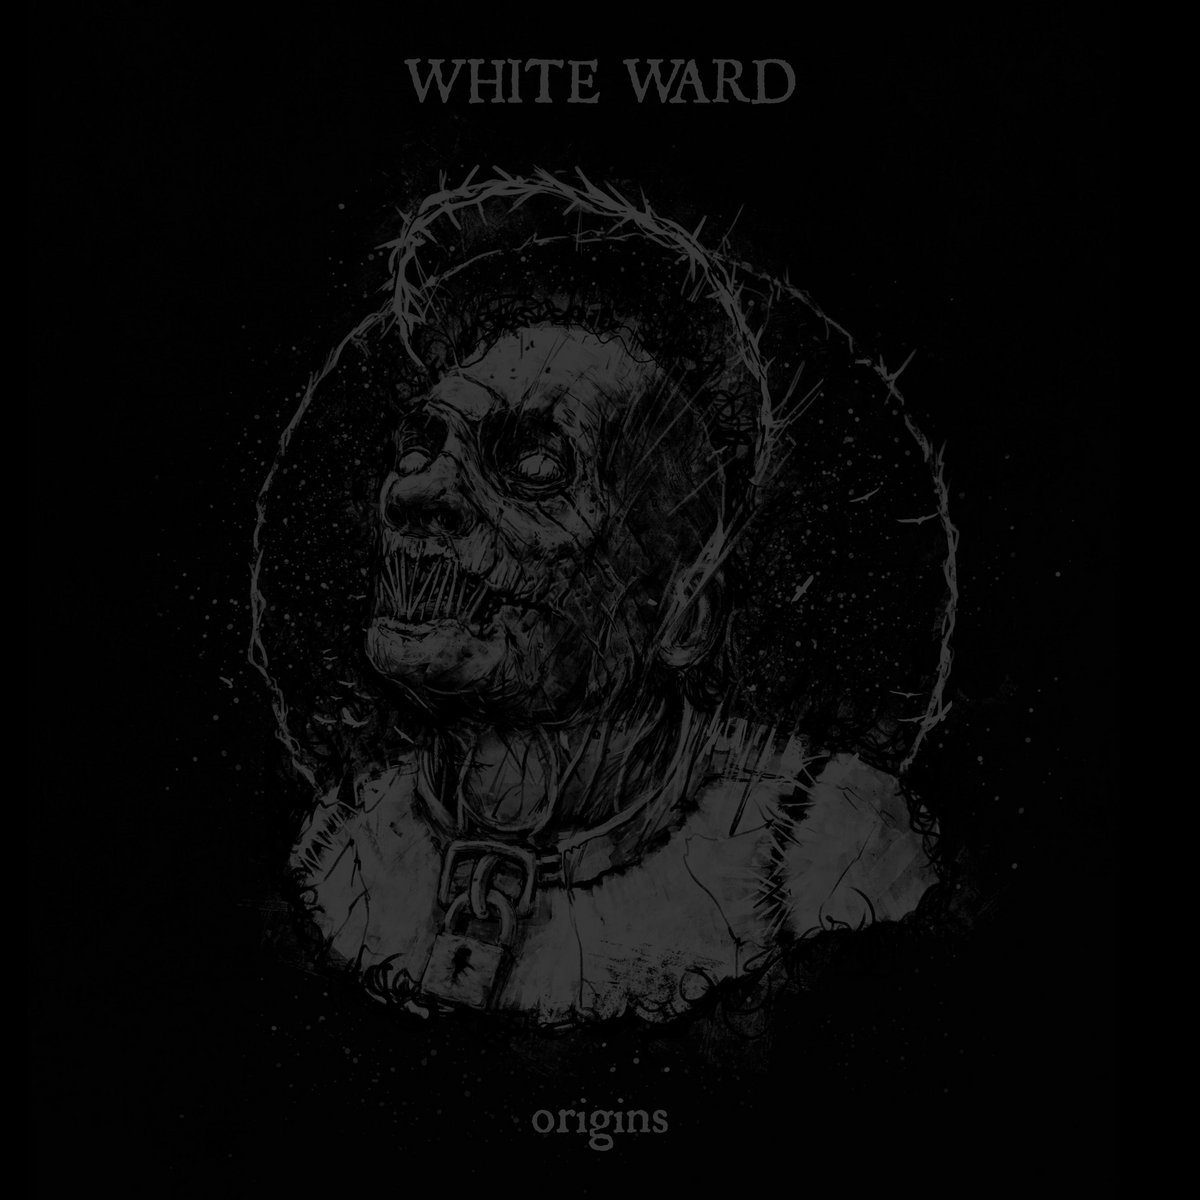 WHITE WARD AVANT GARDE BM LE SCRIBE